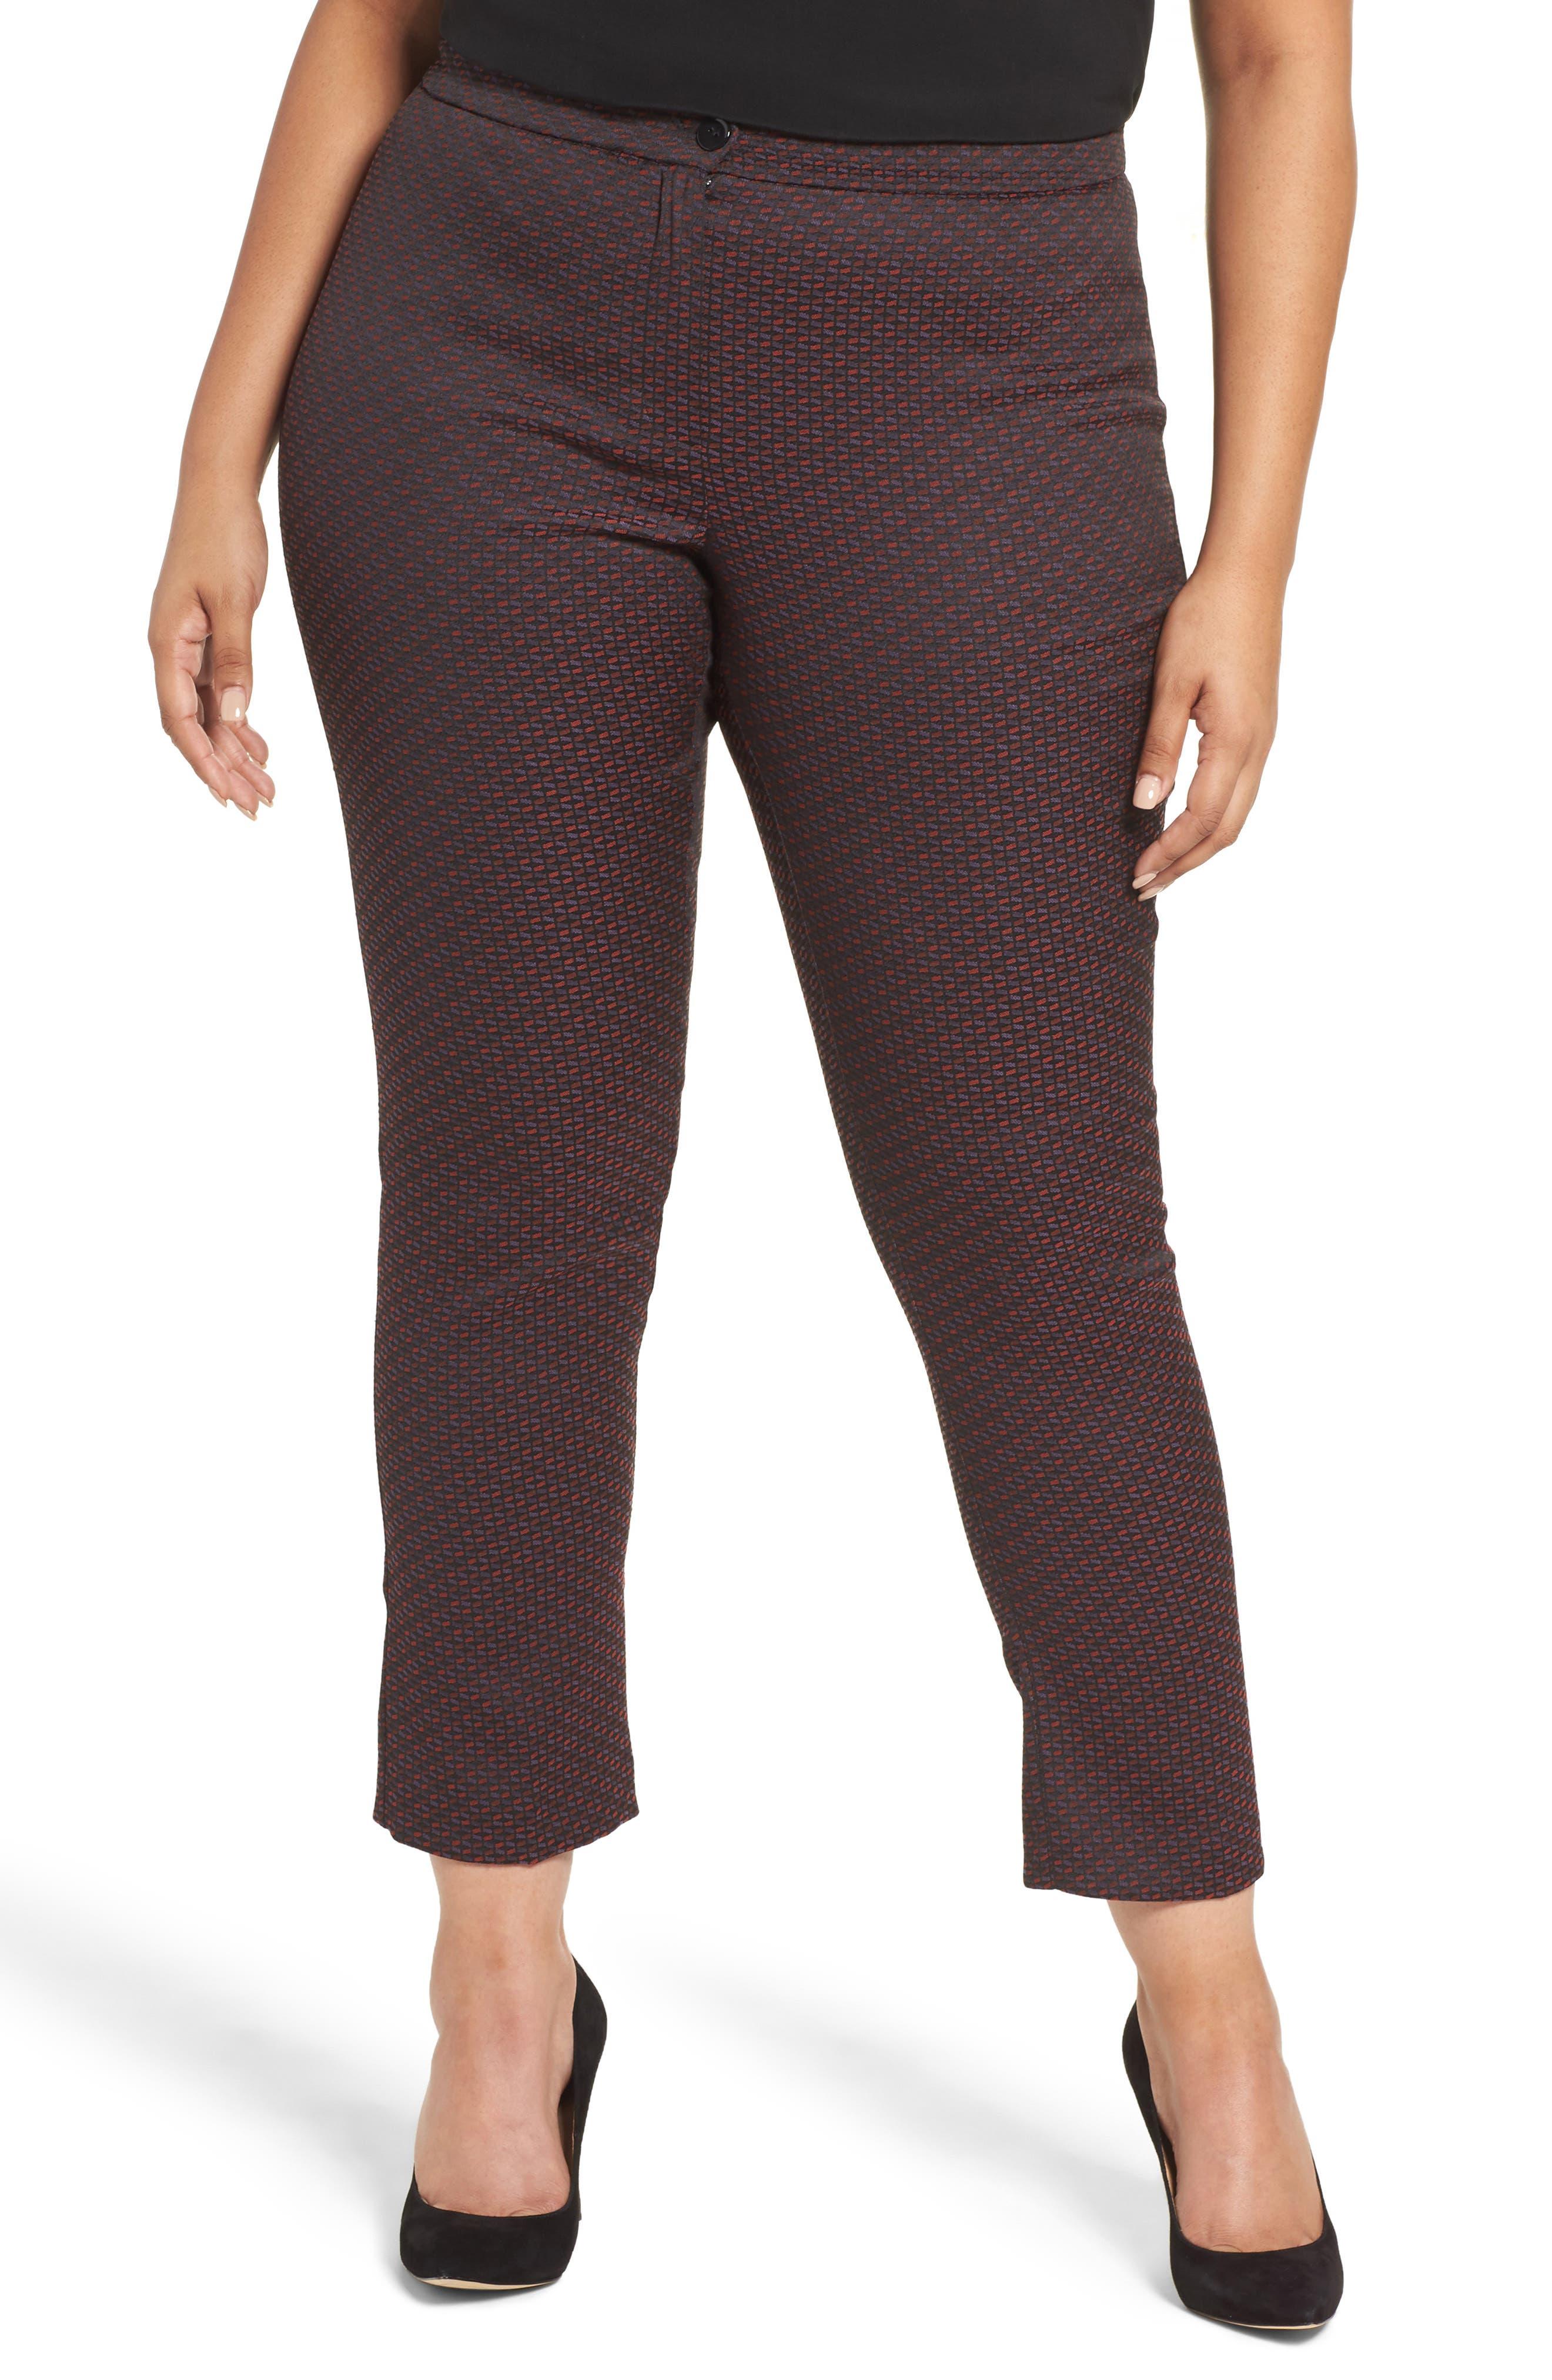 Main Image - Persona by Marina Rinaldi Rombo Jacquard Slim Crop Trousers (Plus Size)